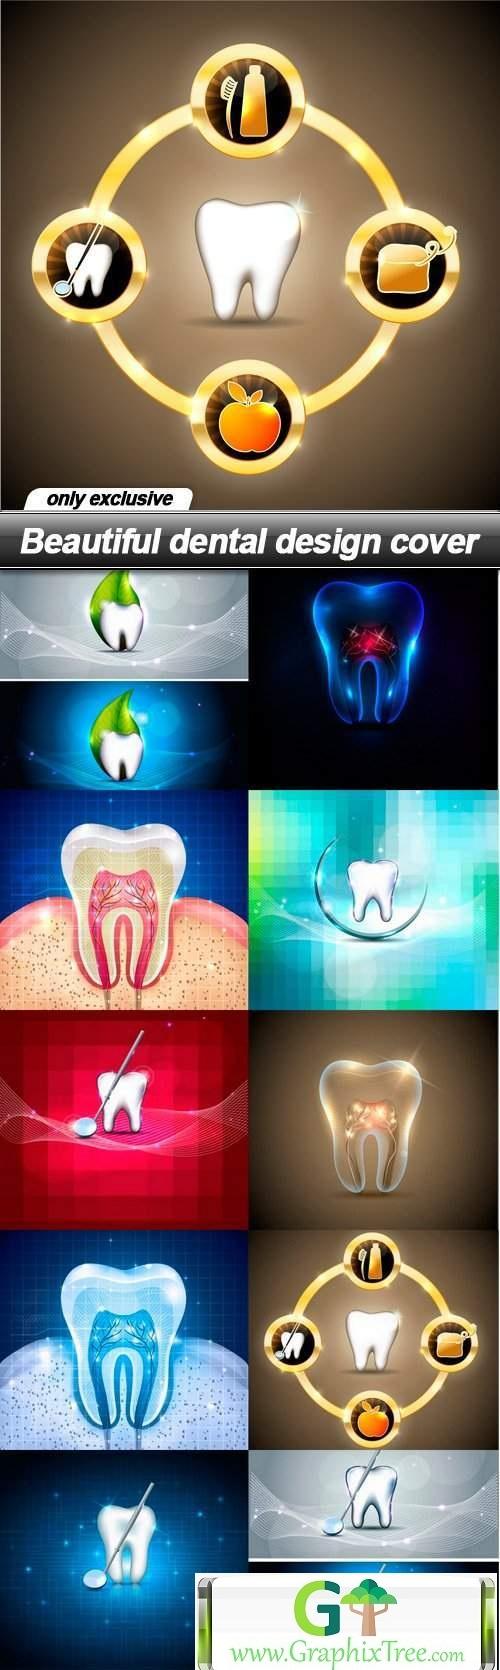 Beautiful dental design cover - 10 EPS